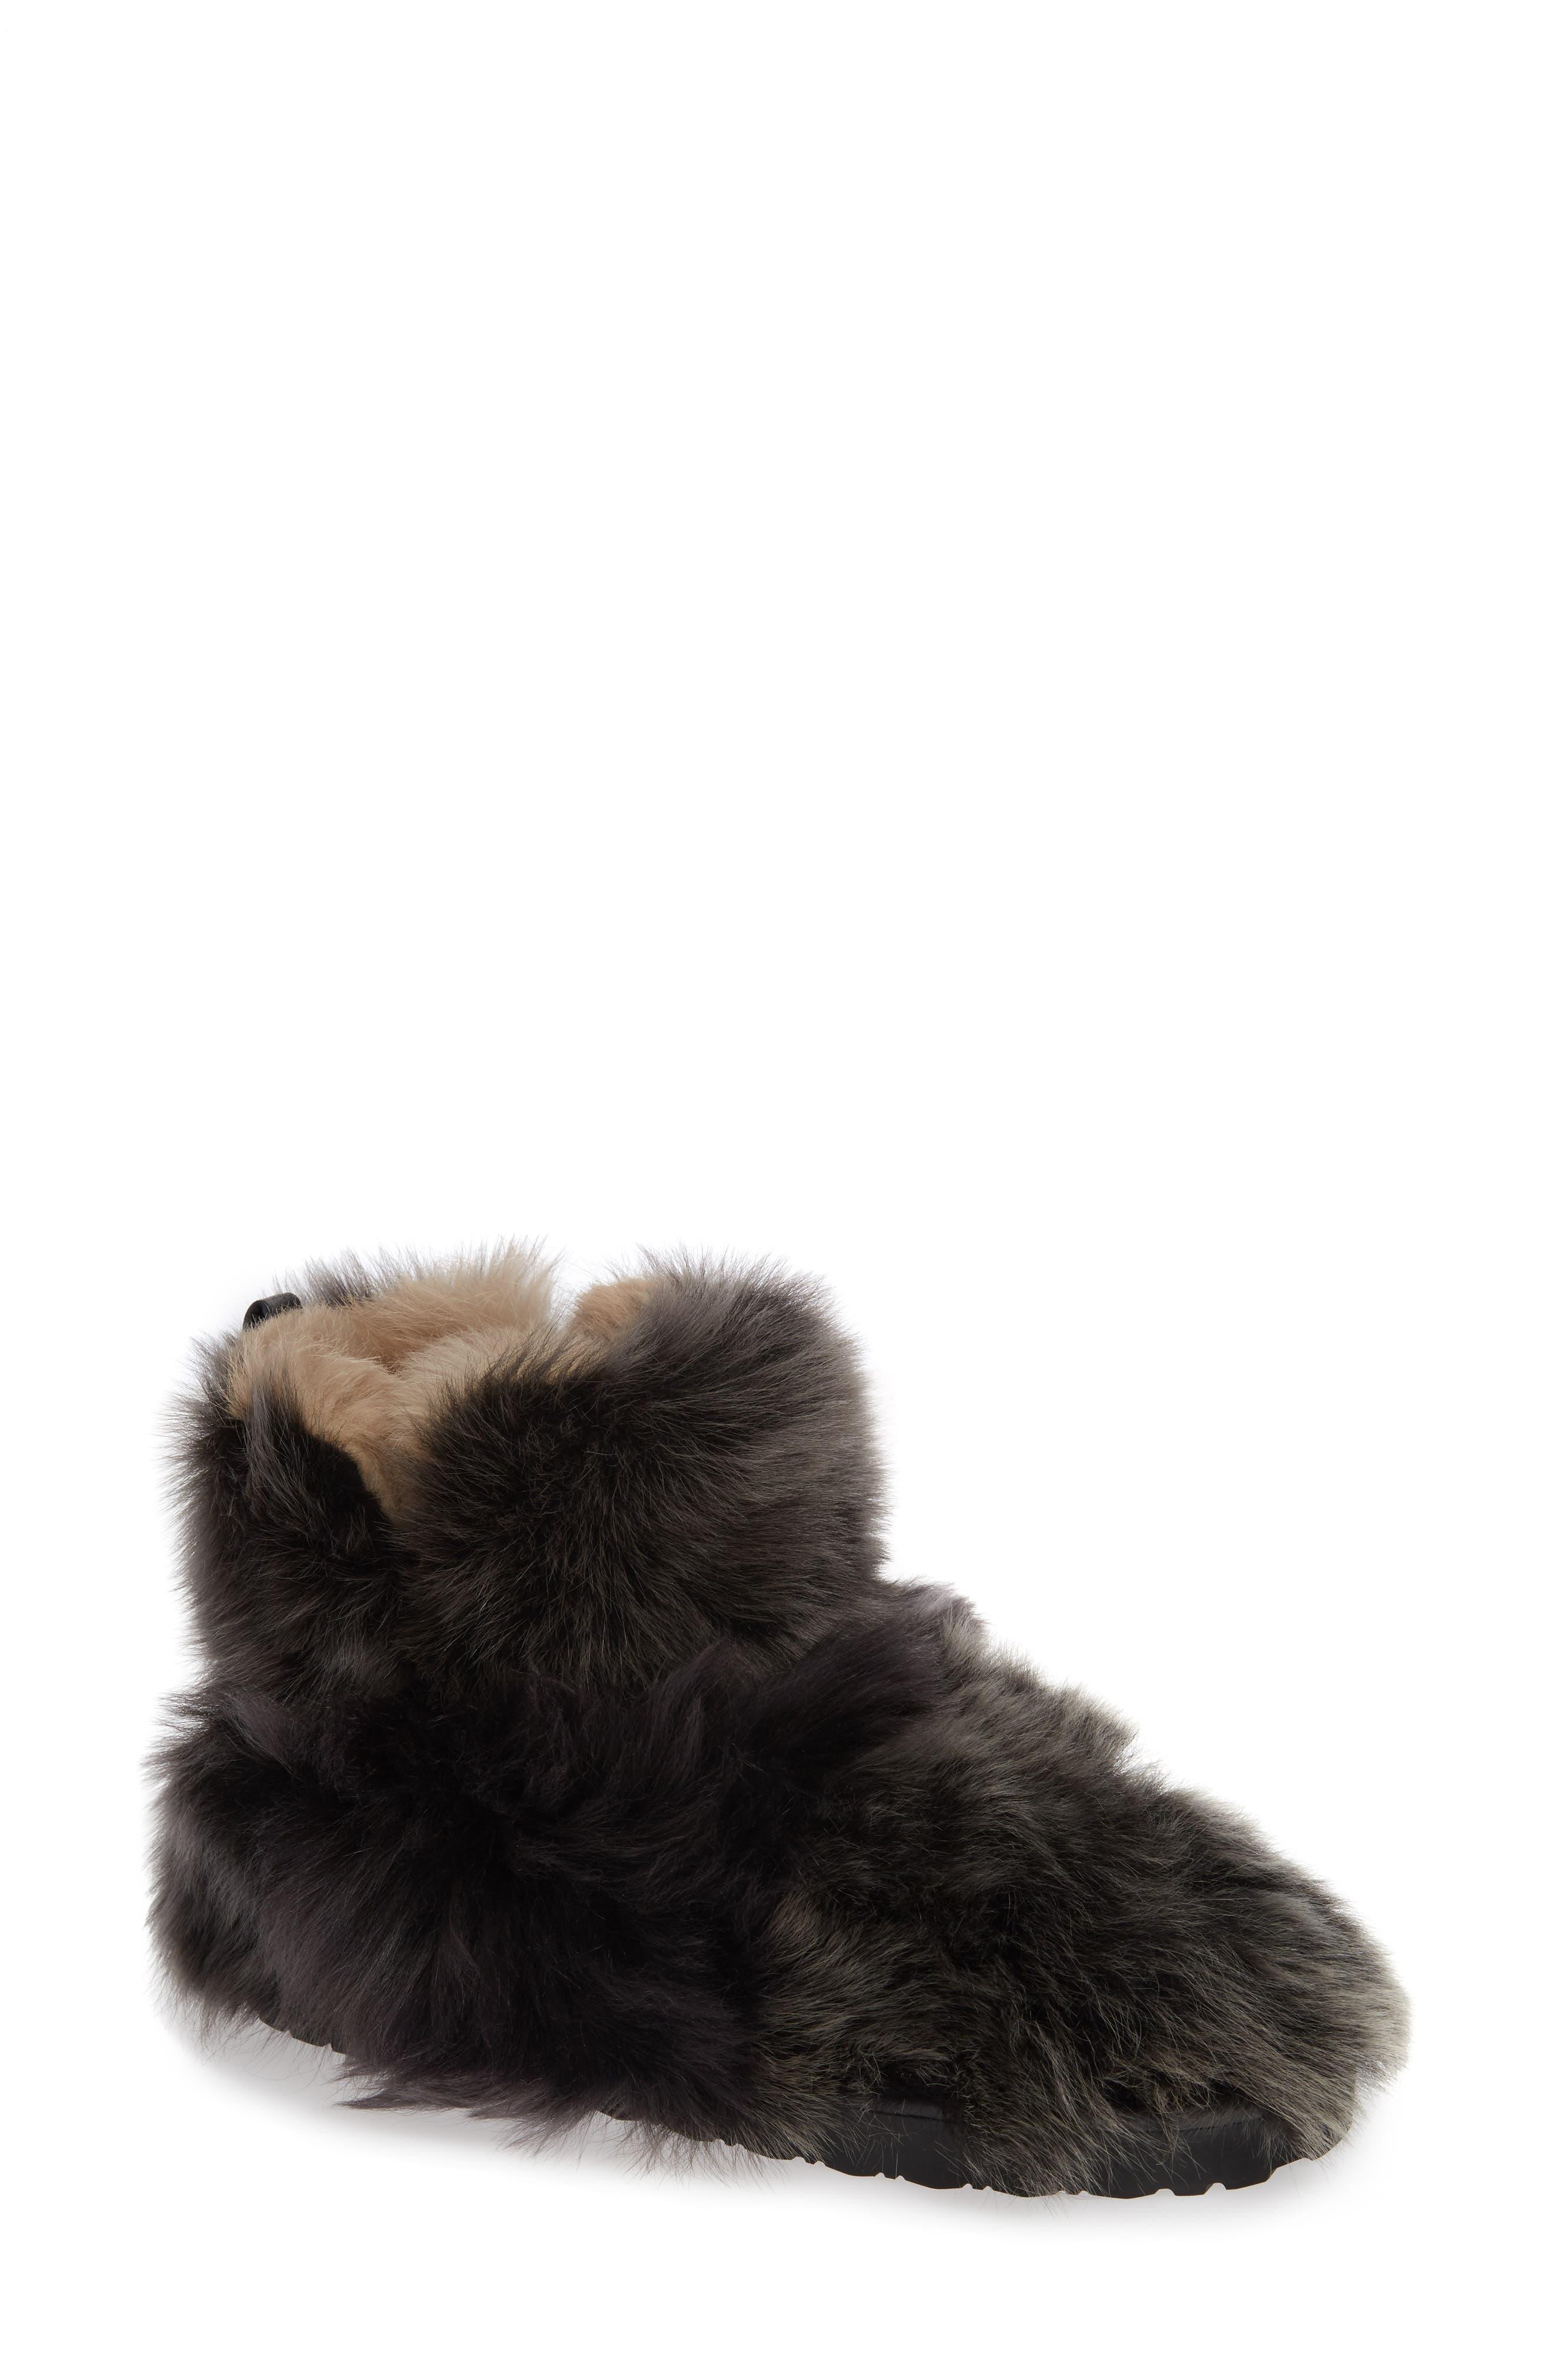 Stuart Weitzman Janica Genuine Shearling Bootie- Black